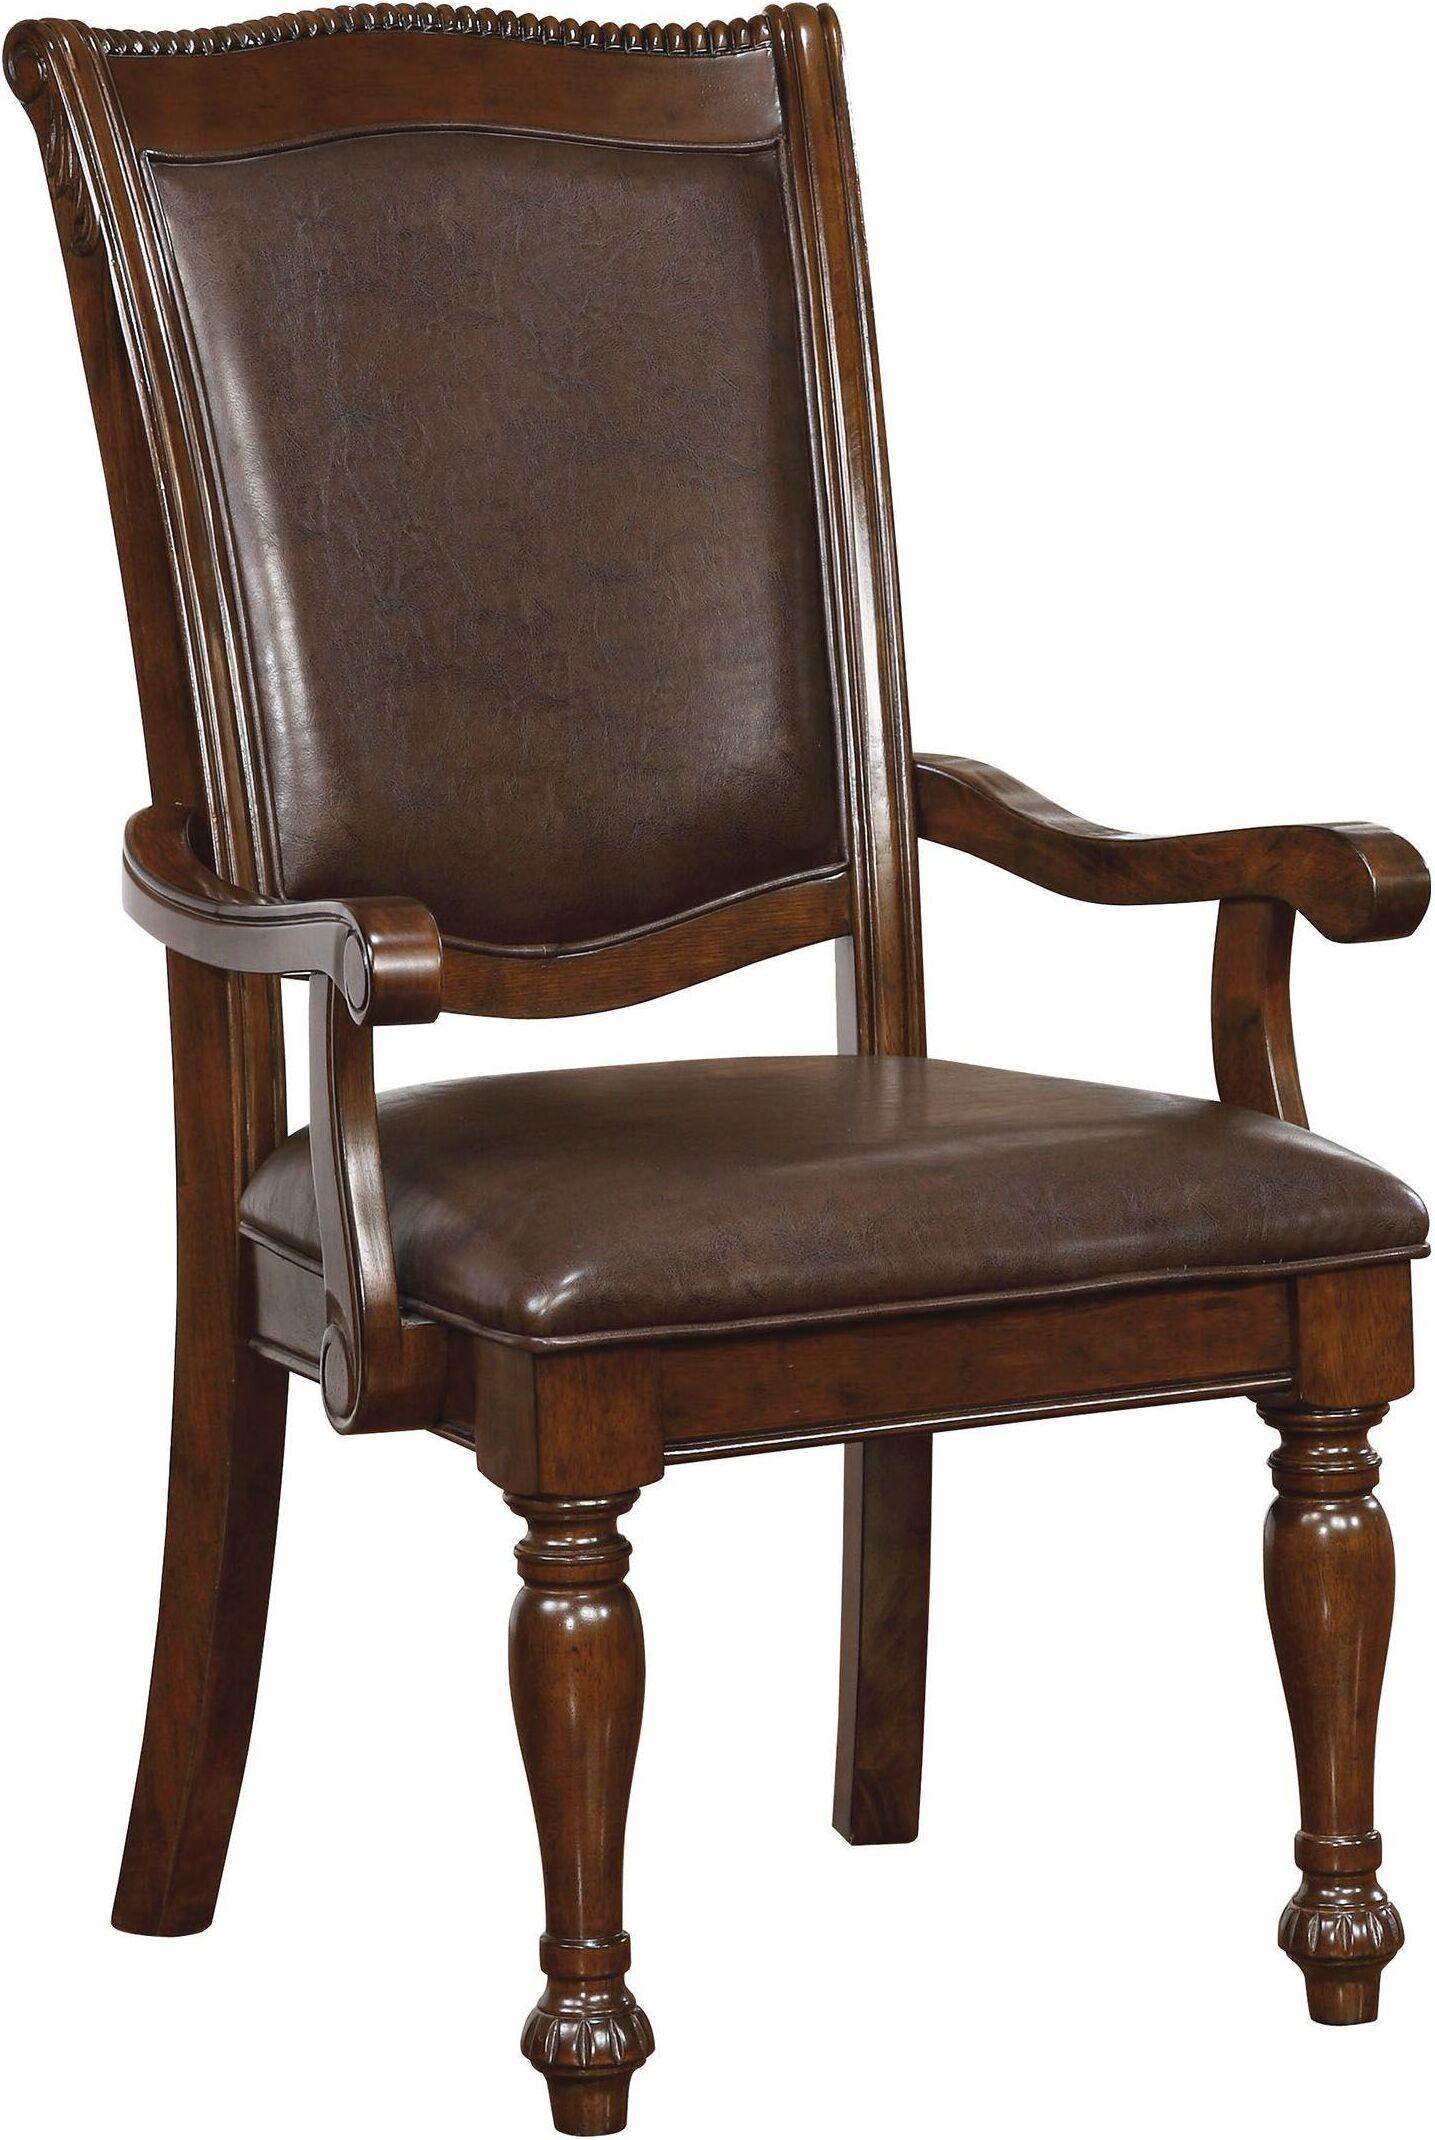 Furniture Of America Lennart Ii White Panel Bedroom Set: Furniture Of America Alpena Brown Cherry Arm Chair Set Of